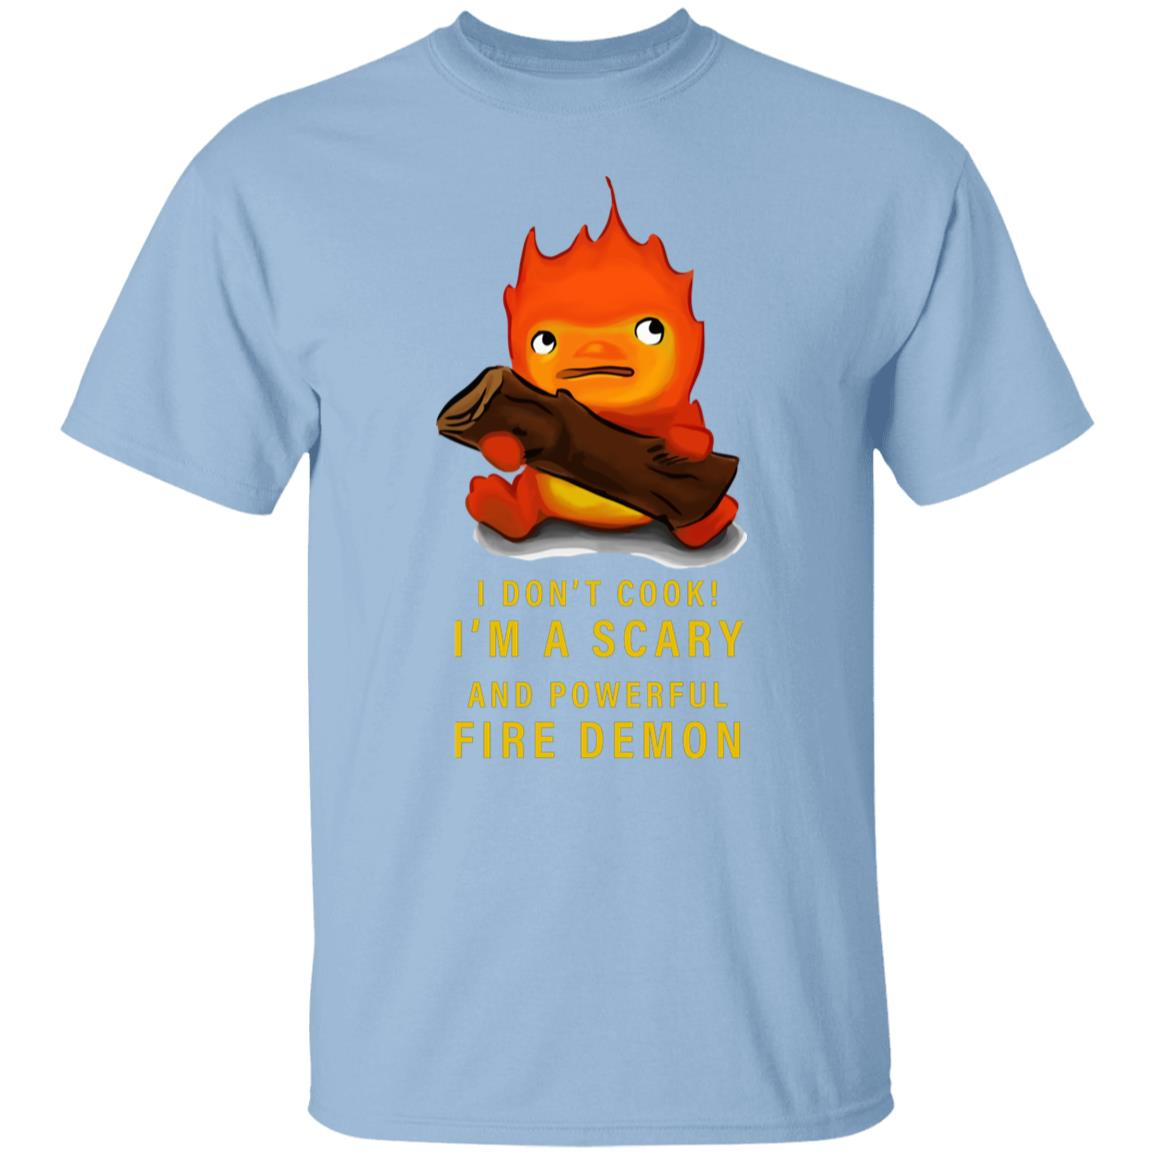 Howl's Moving Castle Calcifer T Shirt